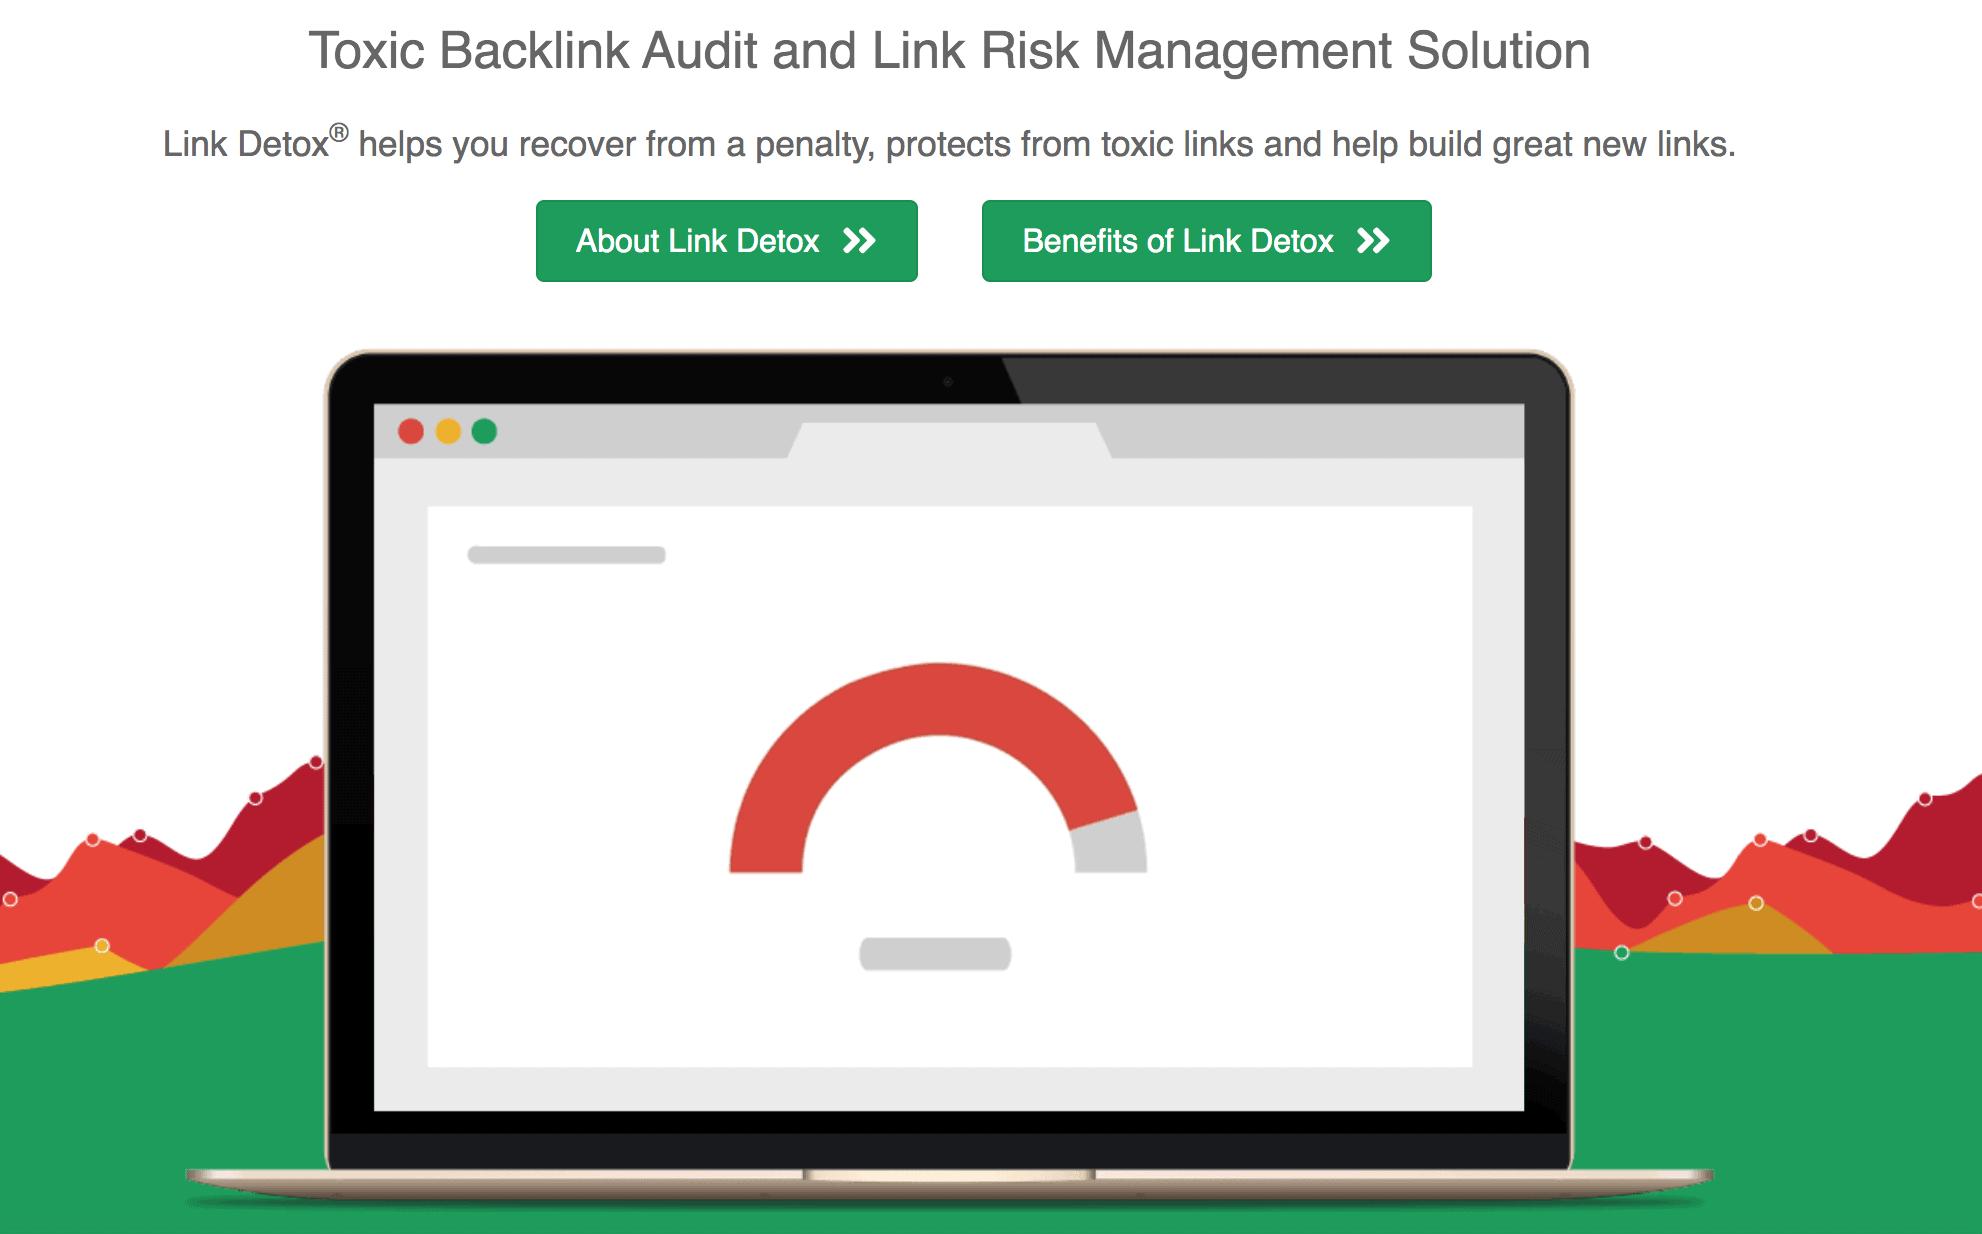 Link Detox Landing Page Snippet